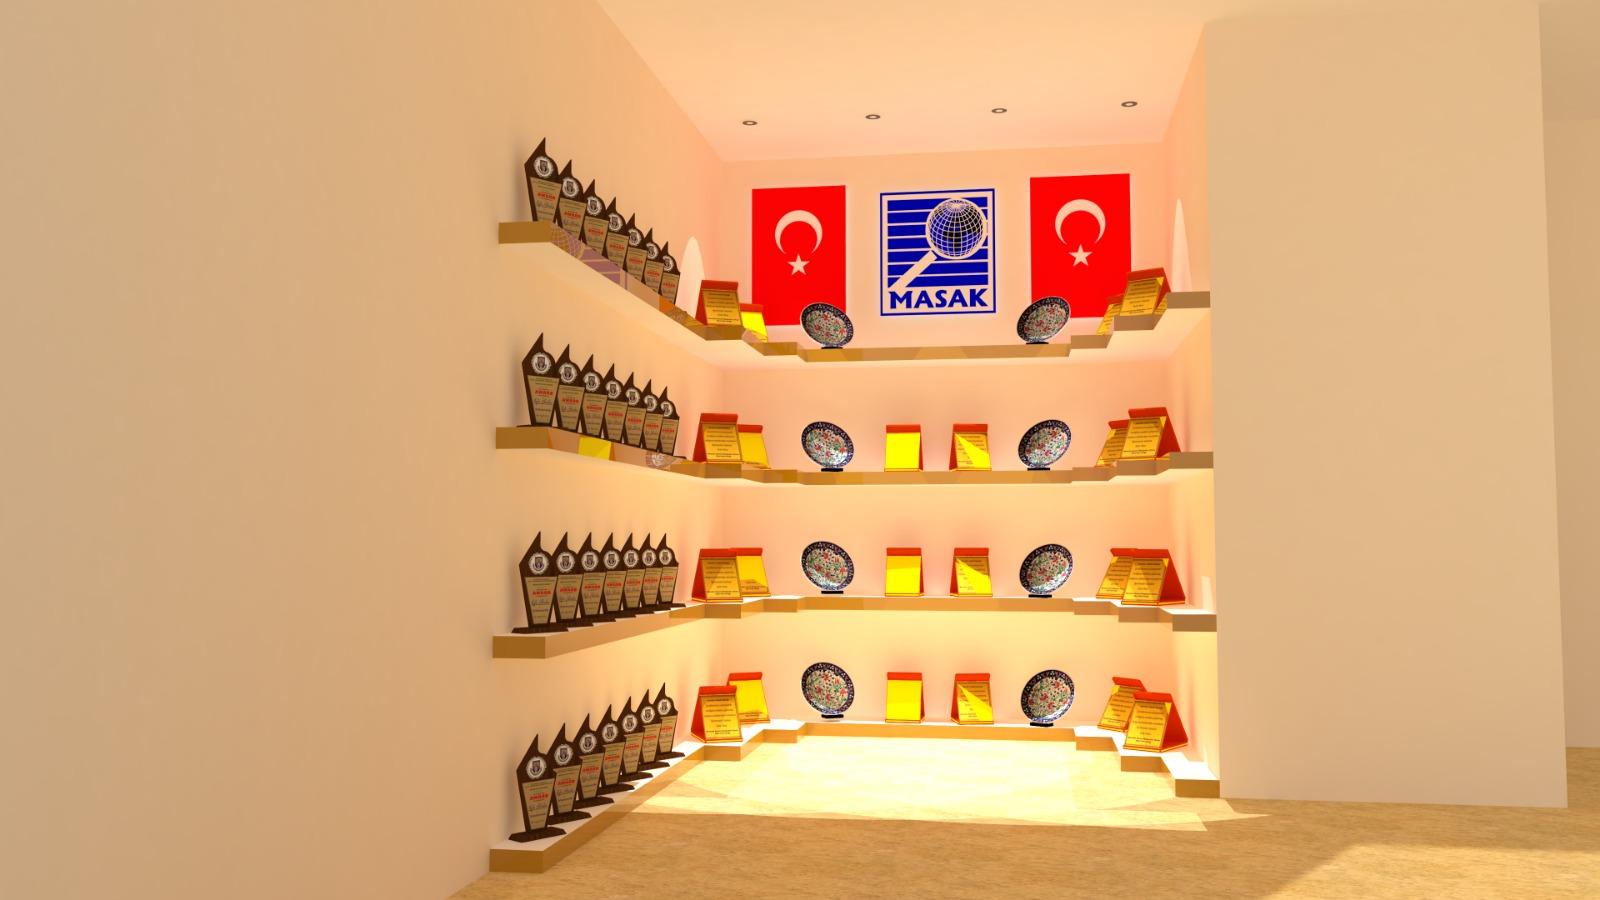 Ankara Tabela, Tabela Ankara, İstanbul Tabela, Tabela İstanbul, Ankara Tabela Firmaları, Ankara Tabela Reklam, Ankara Yönlendirme, Tabela, Ankara Araç Giydirme, Ankara Araç Kaplama, Anka (21)